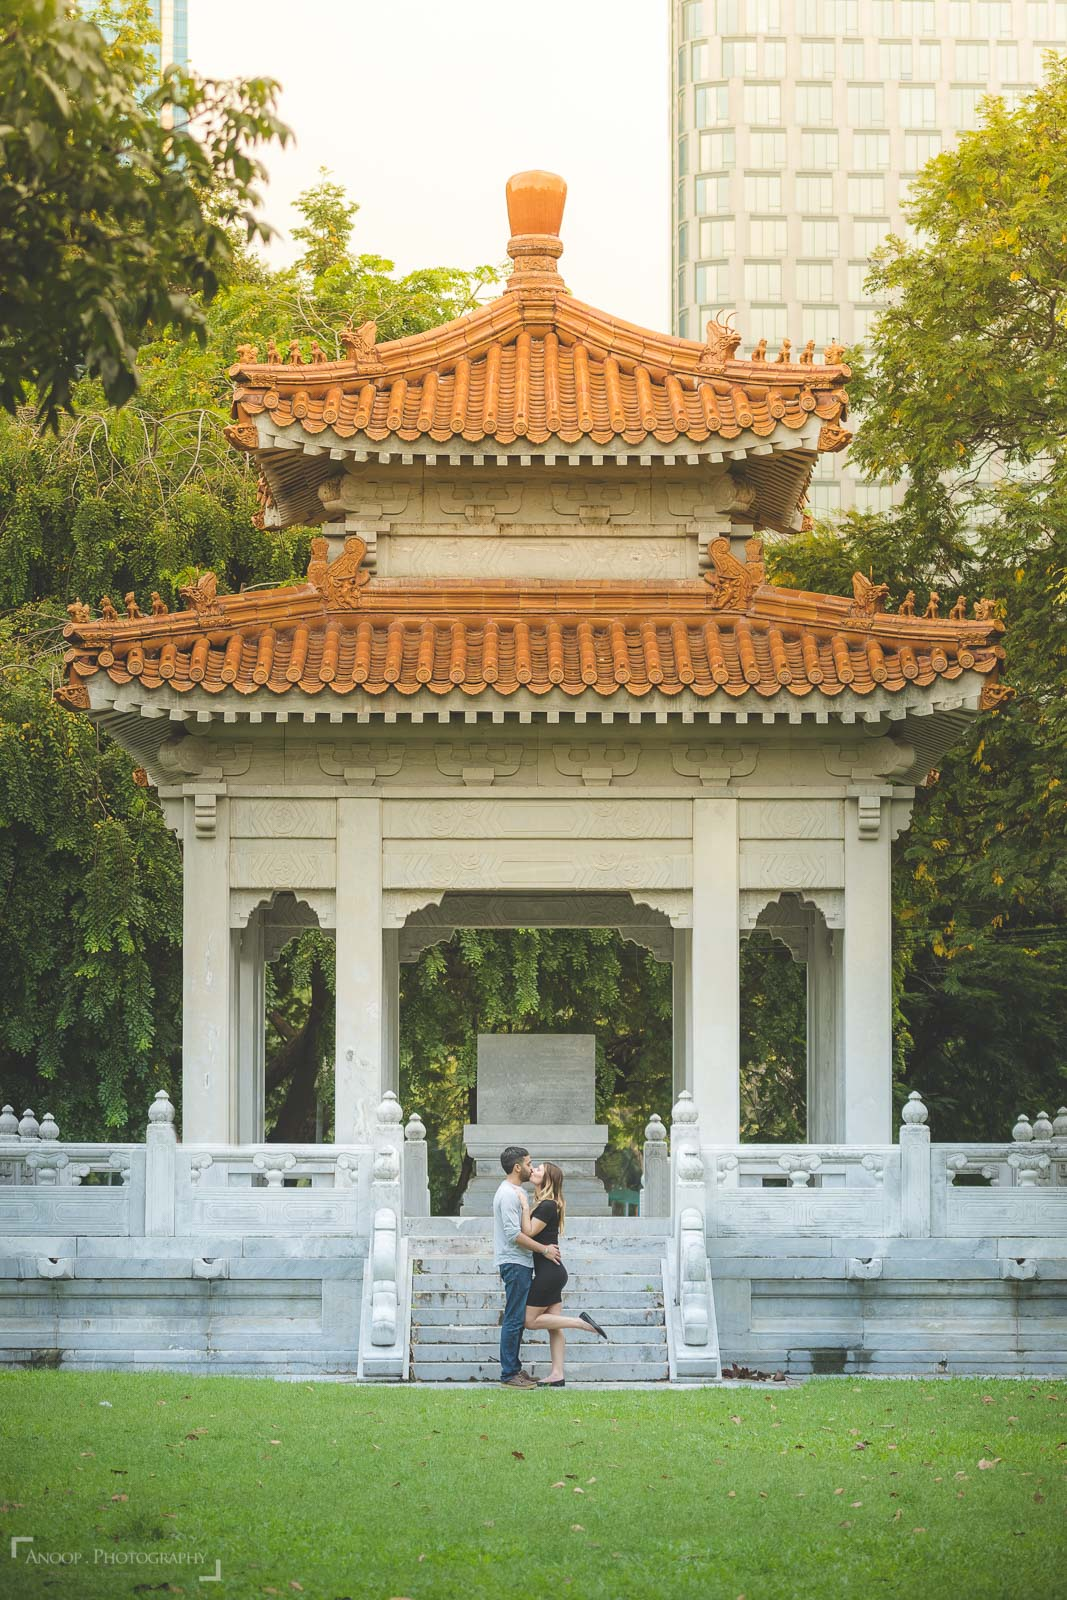 surprise-proposal-photography-thailand-marriage-proposal-ideas-photos24